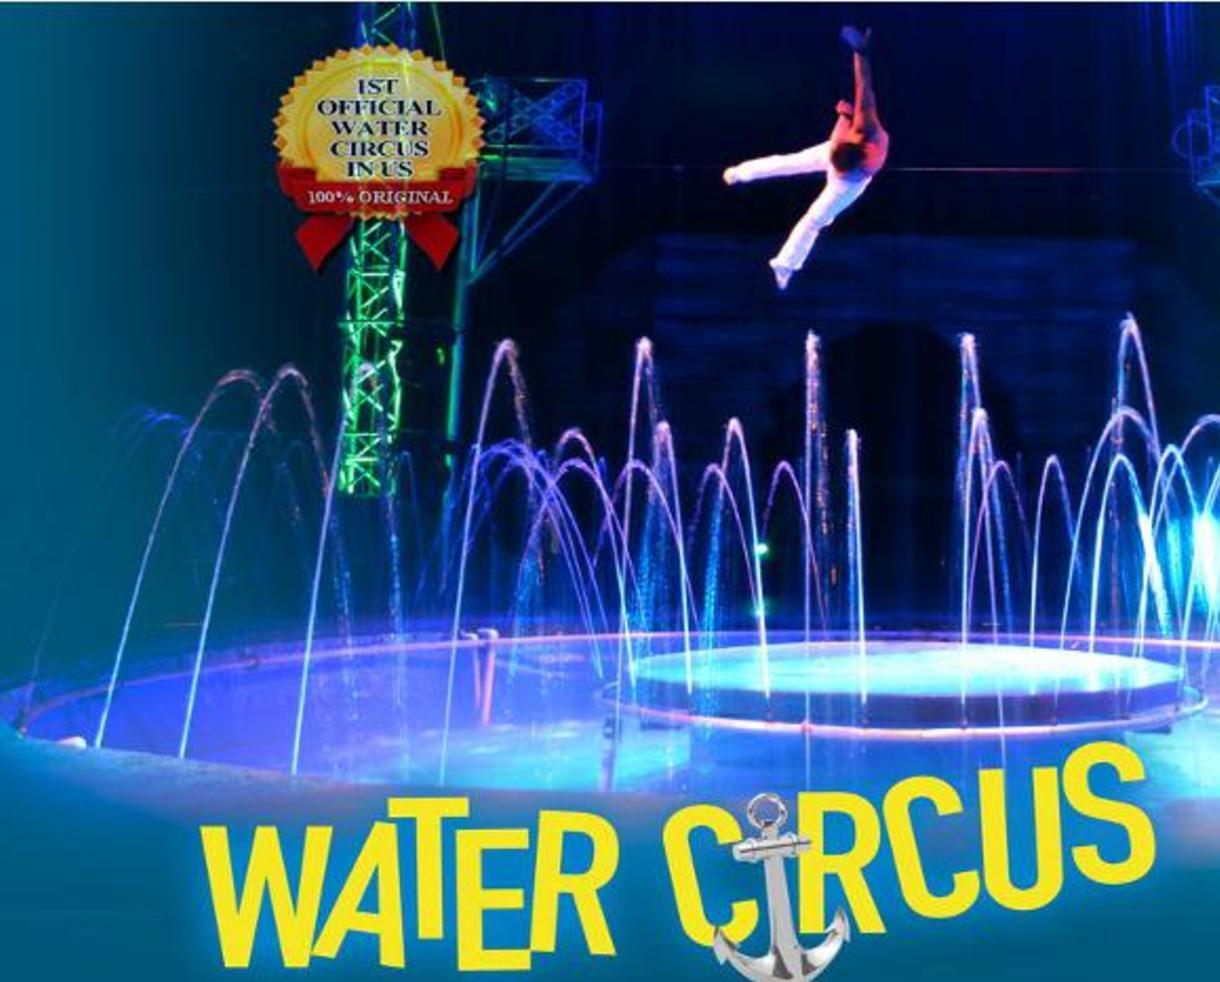 $7.50+ for Cirque Italia Water Circus - Woodbridge, VA or Frederick, MD (50% Off!)